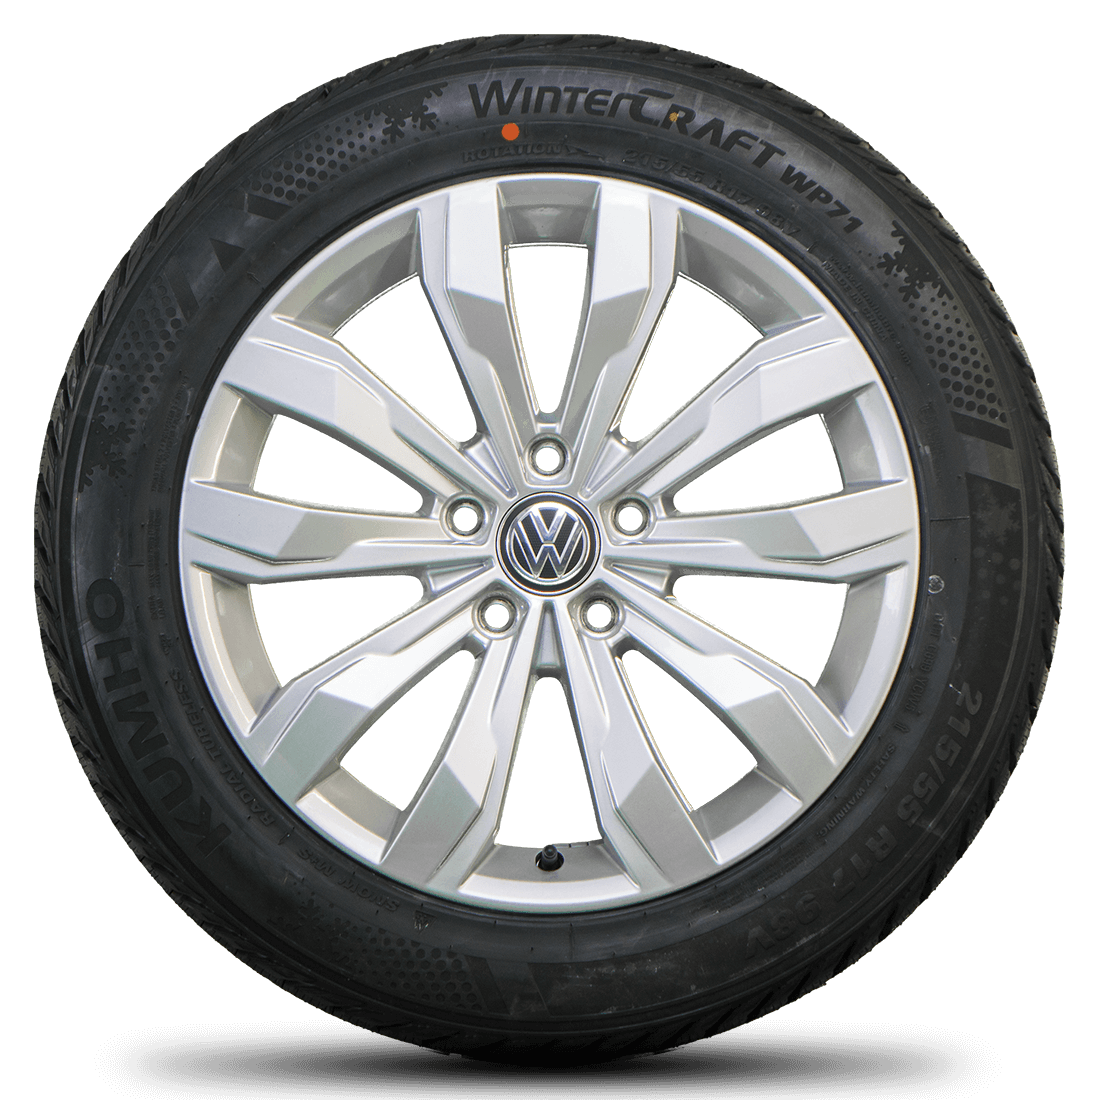 VW 17 inch rims T-Roc A1 Kulmbach aluminum rims winter tires new winter  wheels